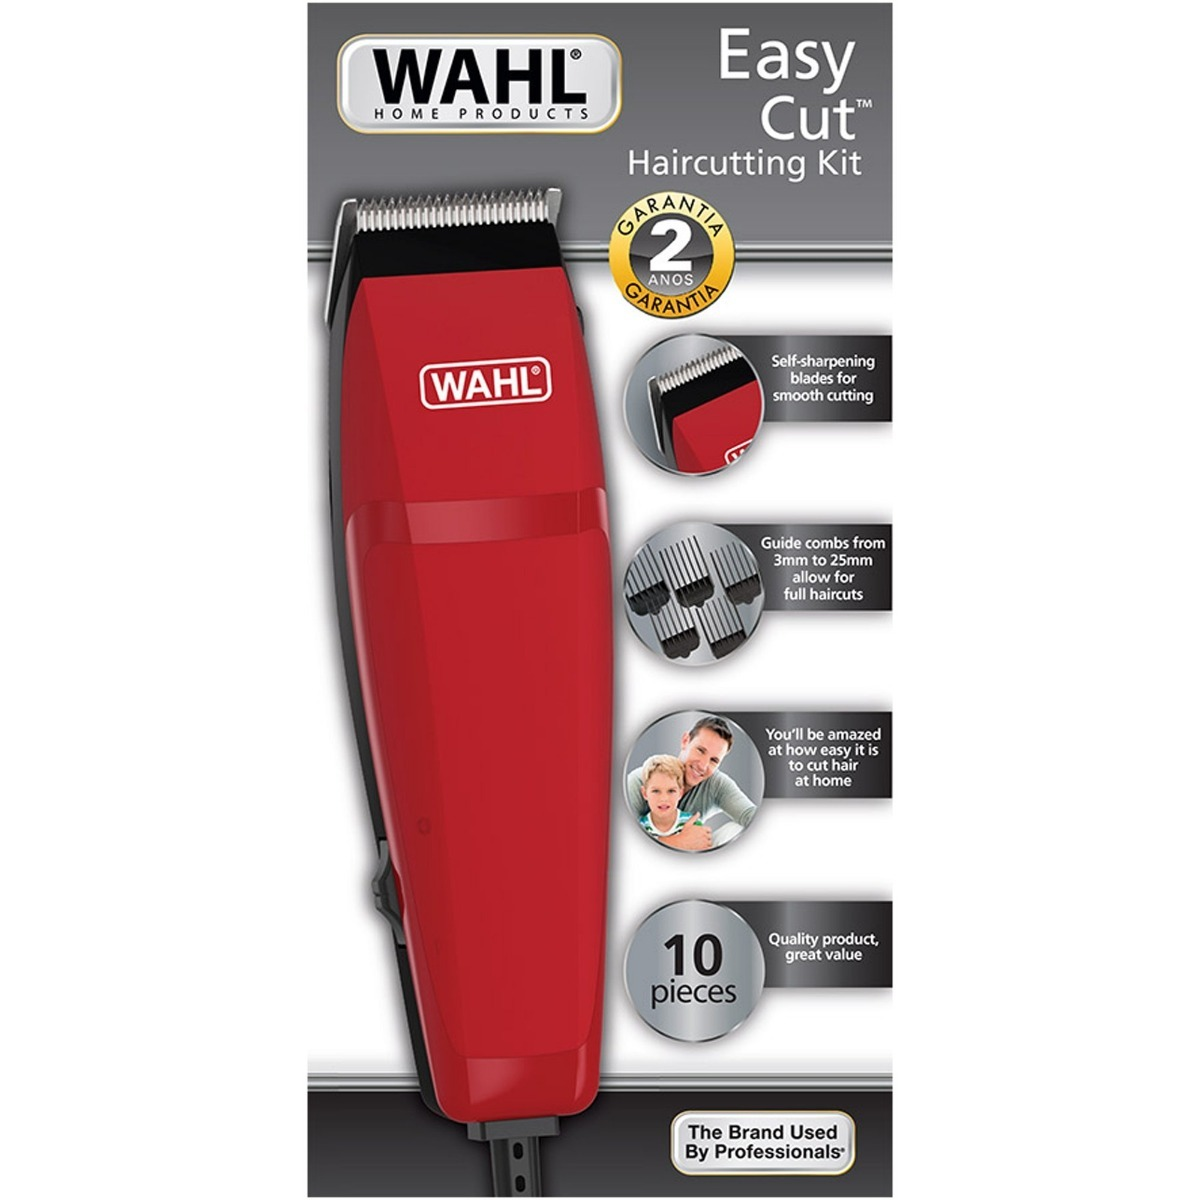 d3dbbf088 cortador de cabelo wahl vr + maquina acabamento aparador. Carregando zoom.